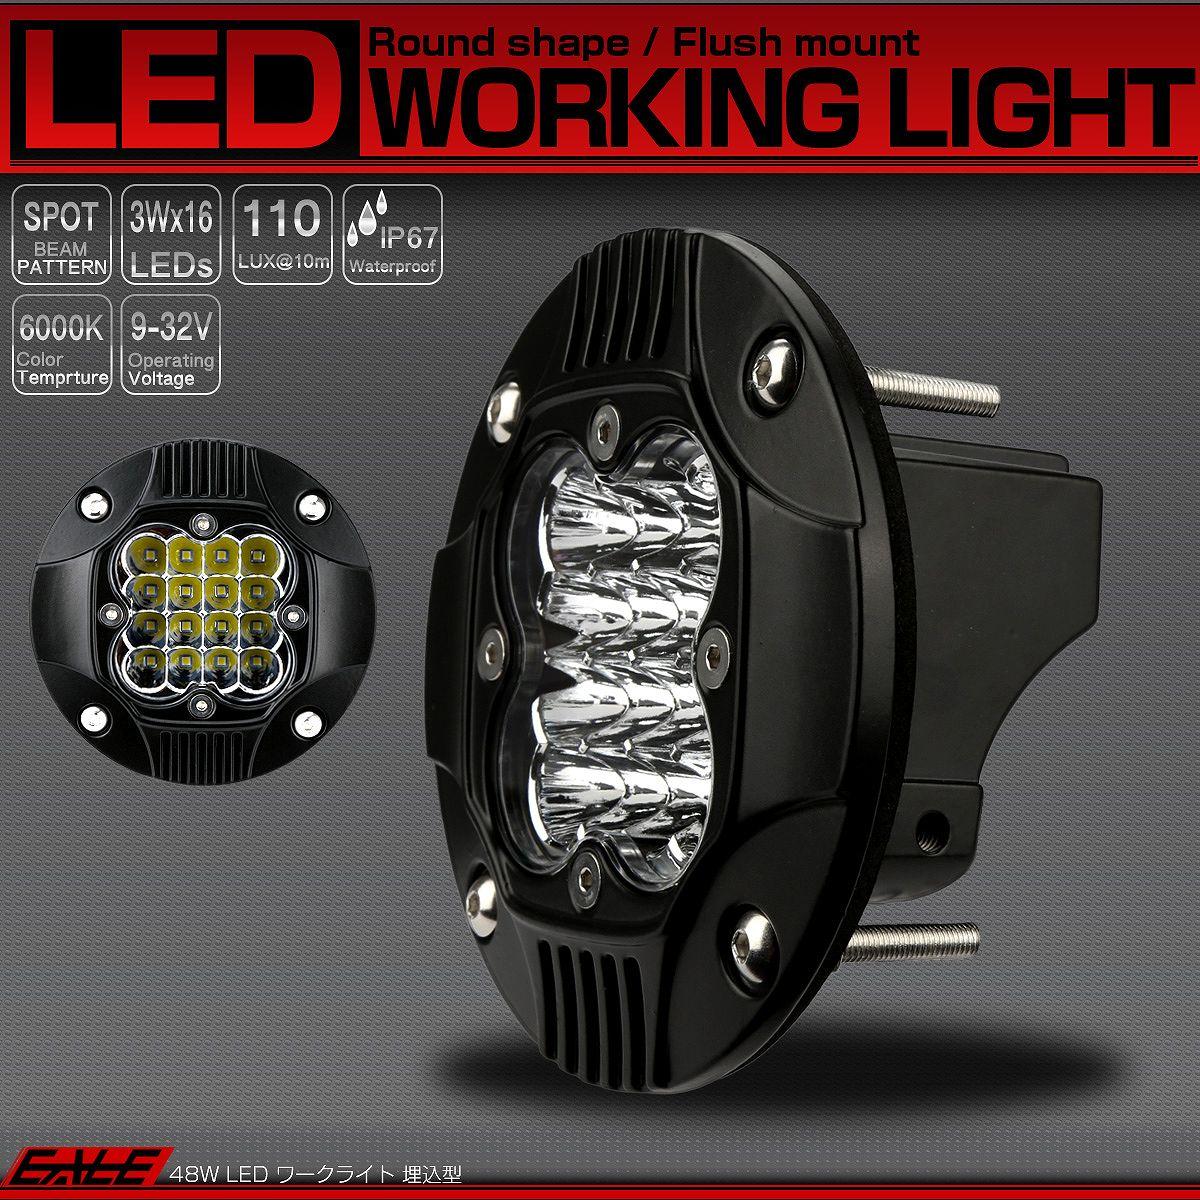 LED 作業灯 丸型 スポットライト 48W フォグランプ バックランプ 補助灯に フラッシュマウント型 12V/24V 防水IP67 P-538